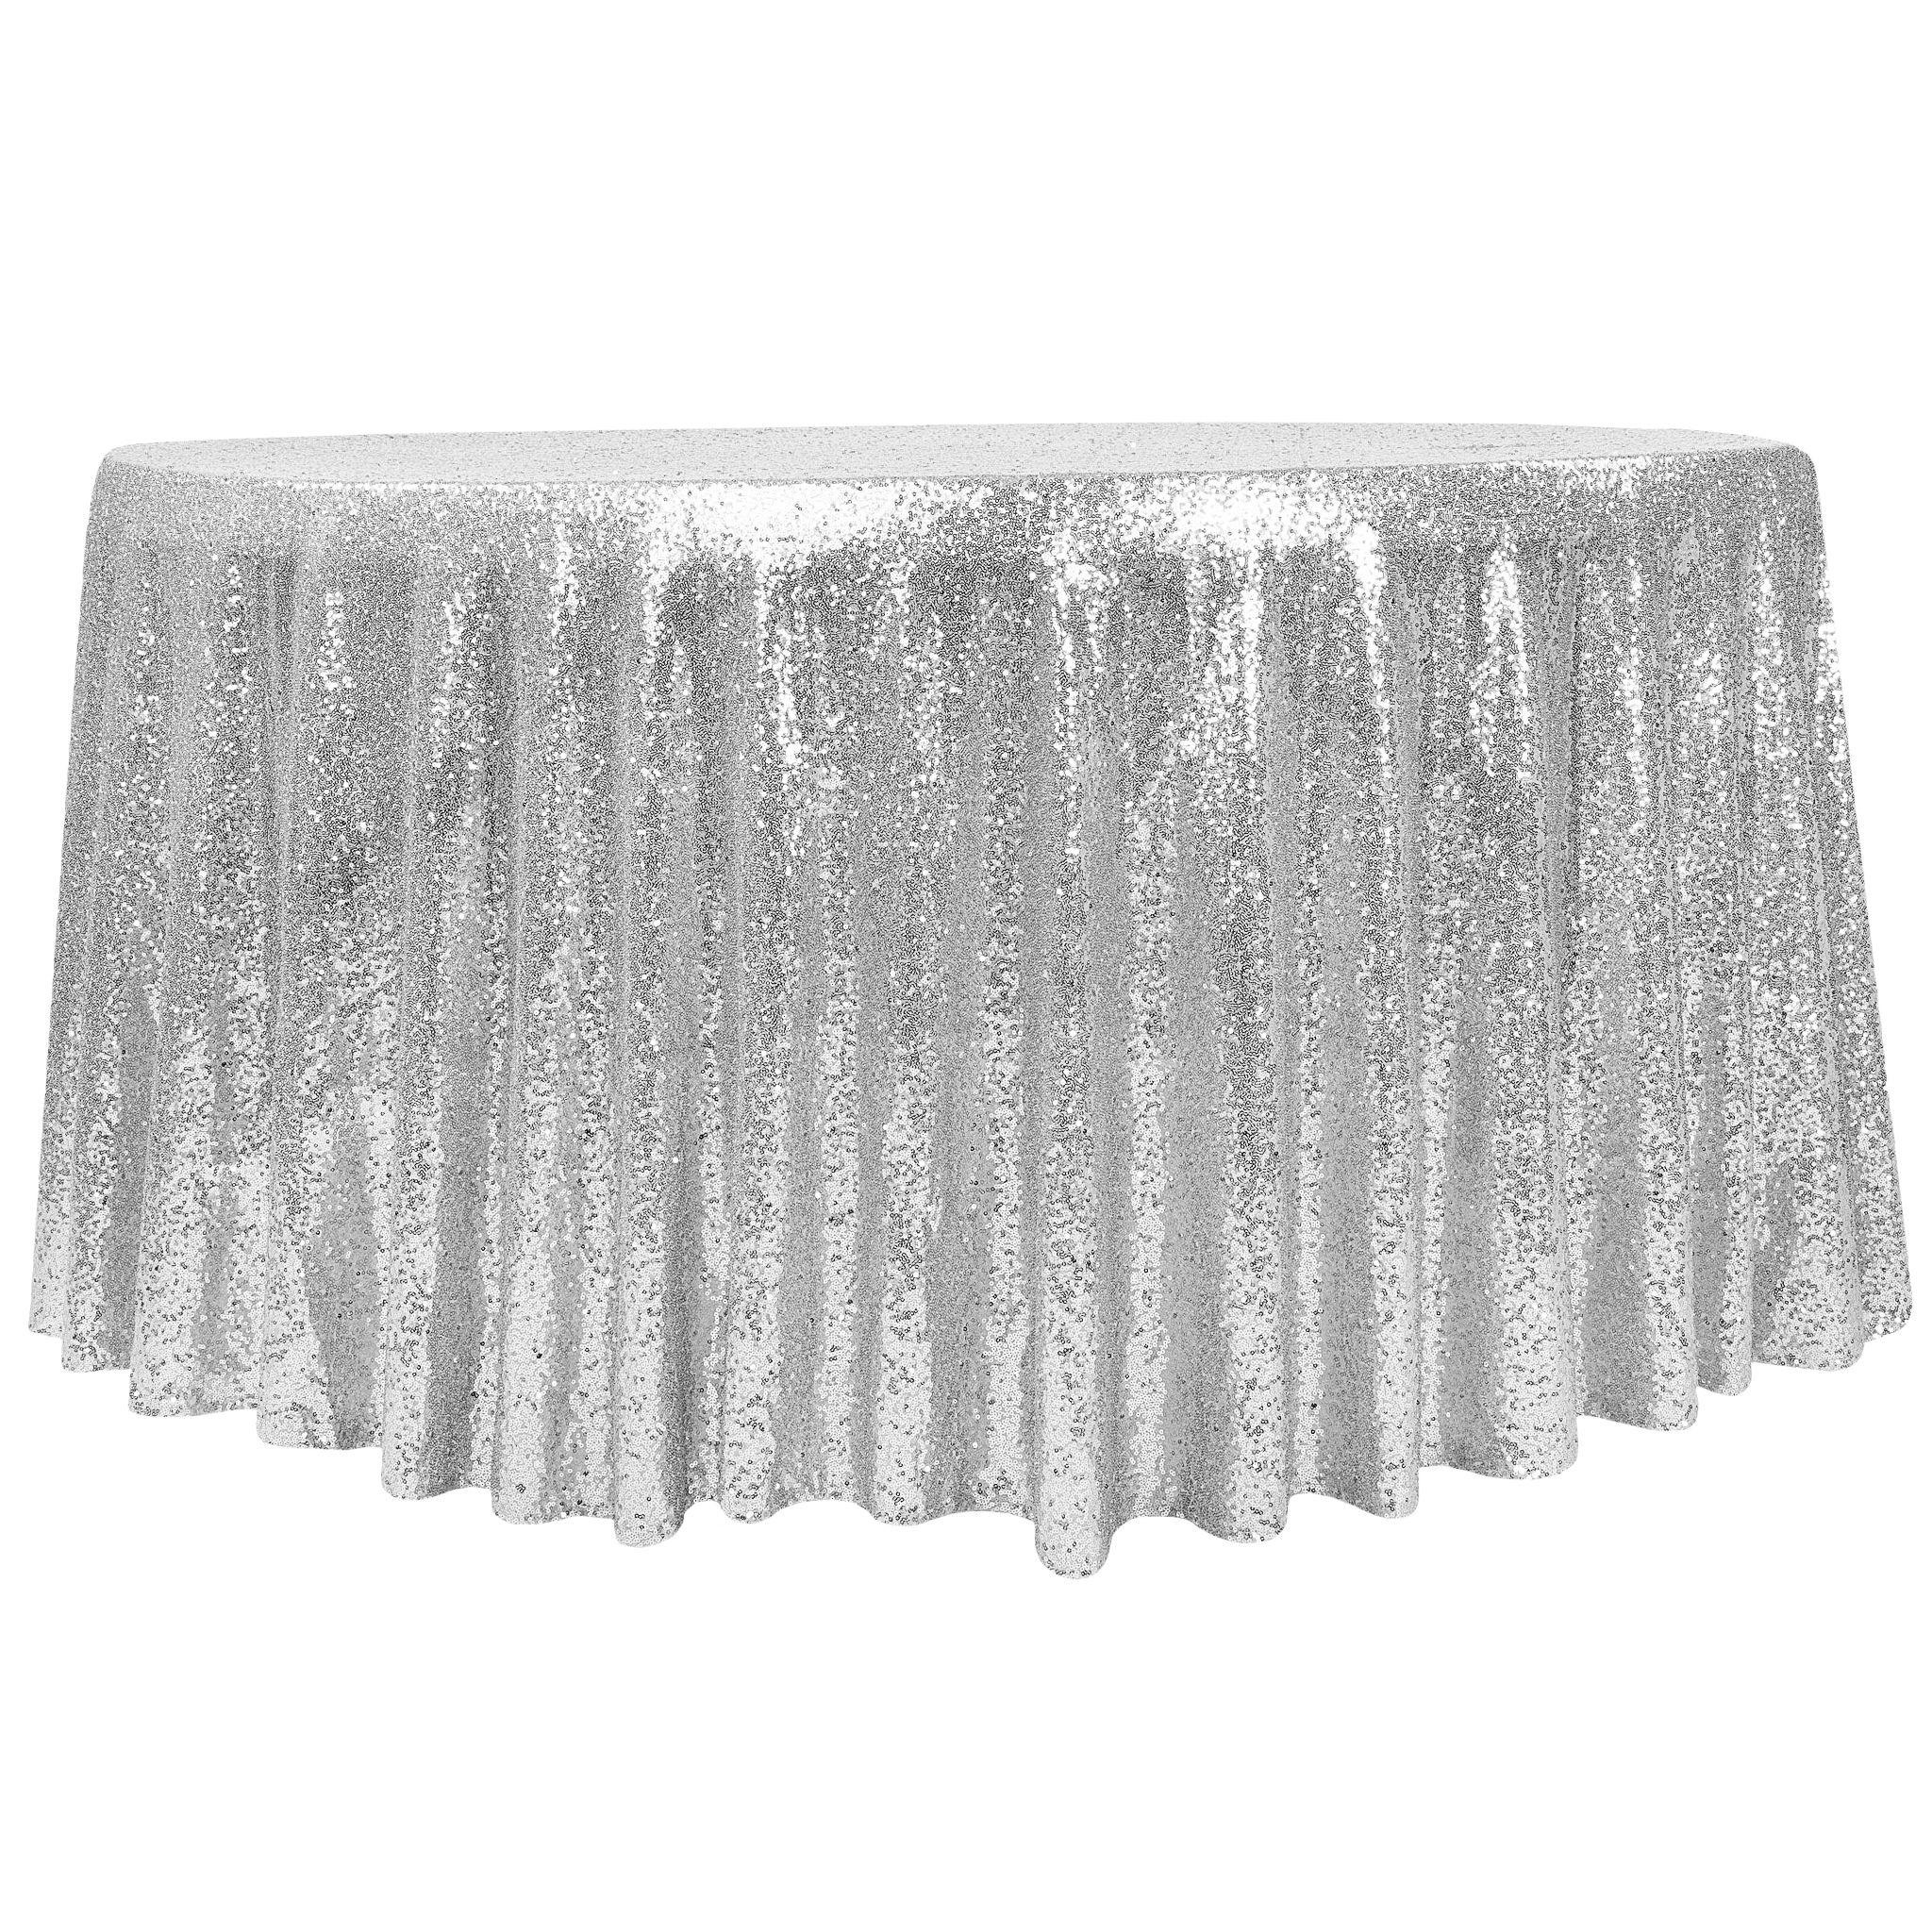 "Glitz Sequin Mesh Net Tablecloth 116"" Round Silver in"